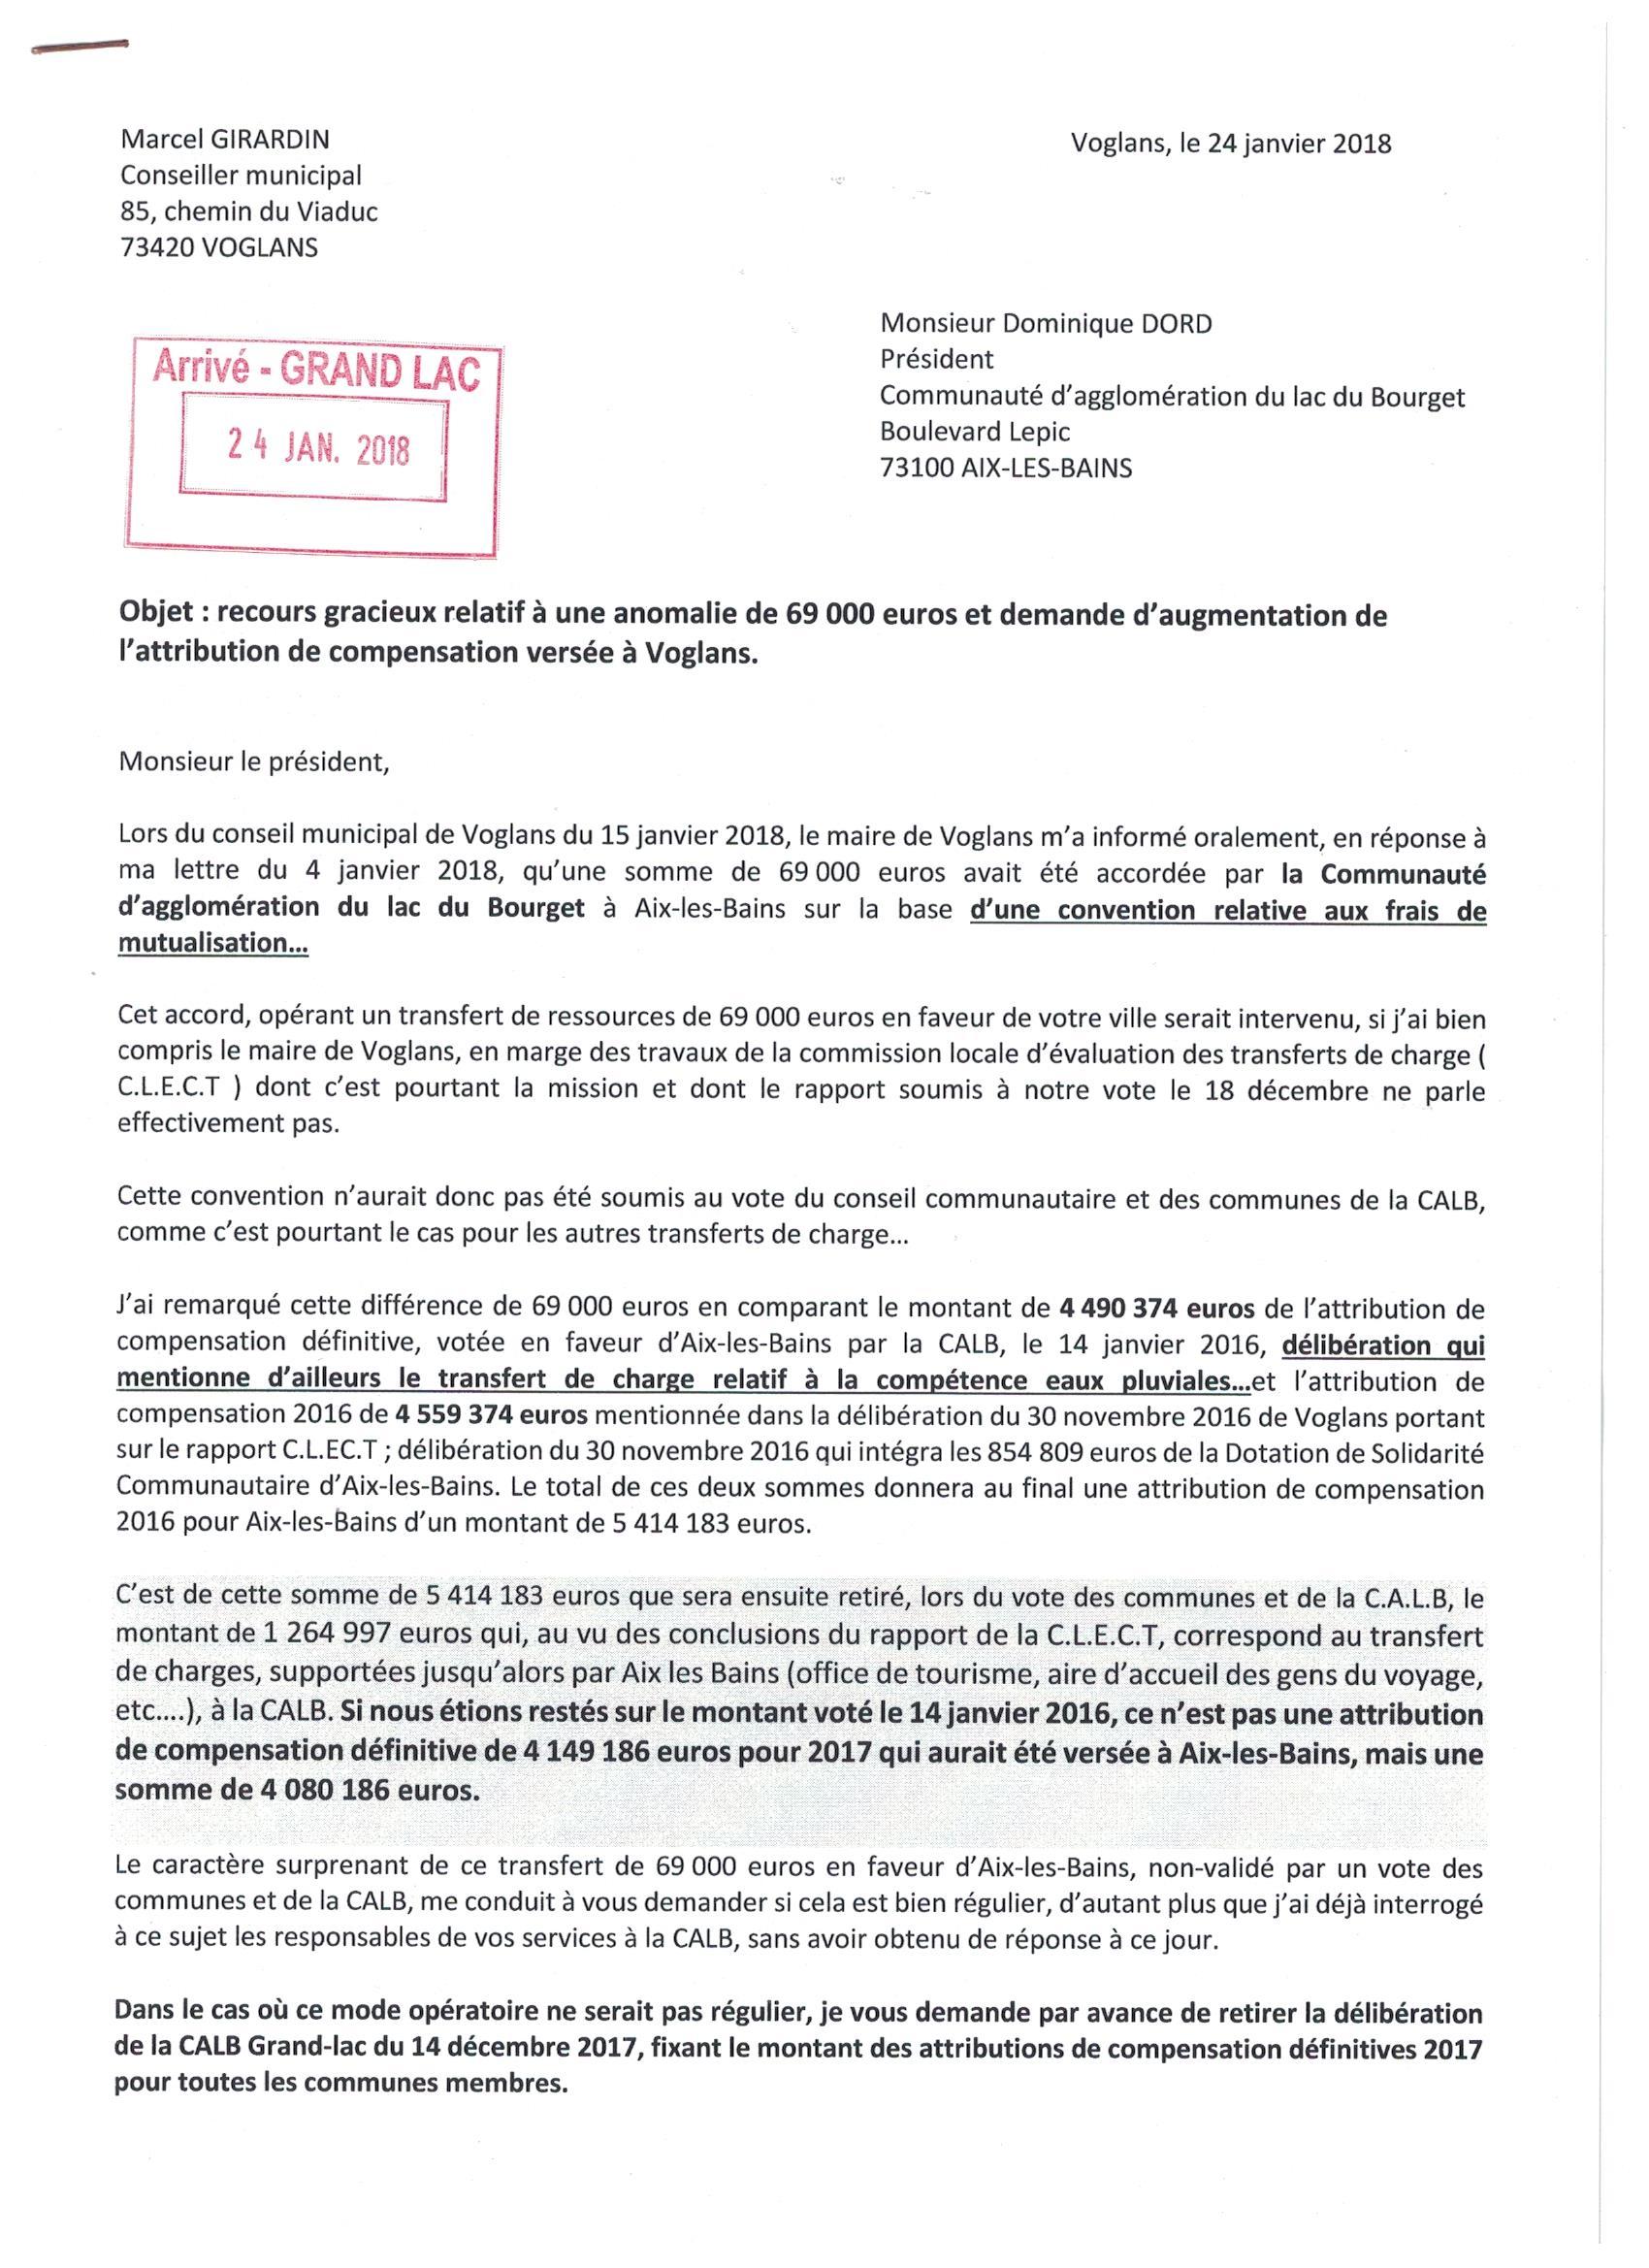 Lettre A Dominique Dord Sur Les Relations Financieres Calb